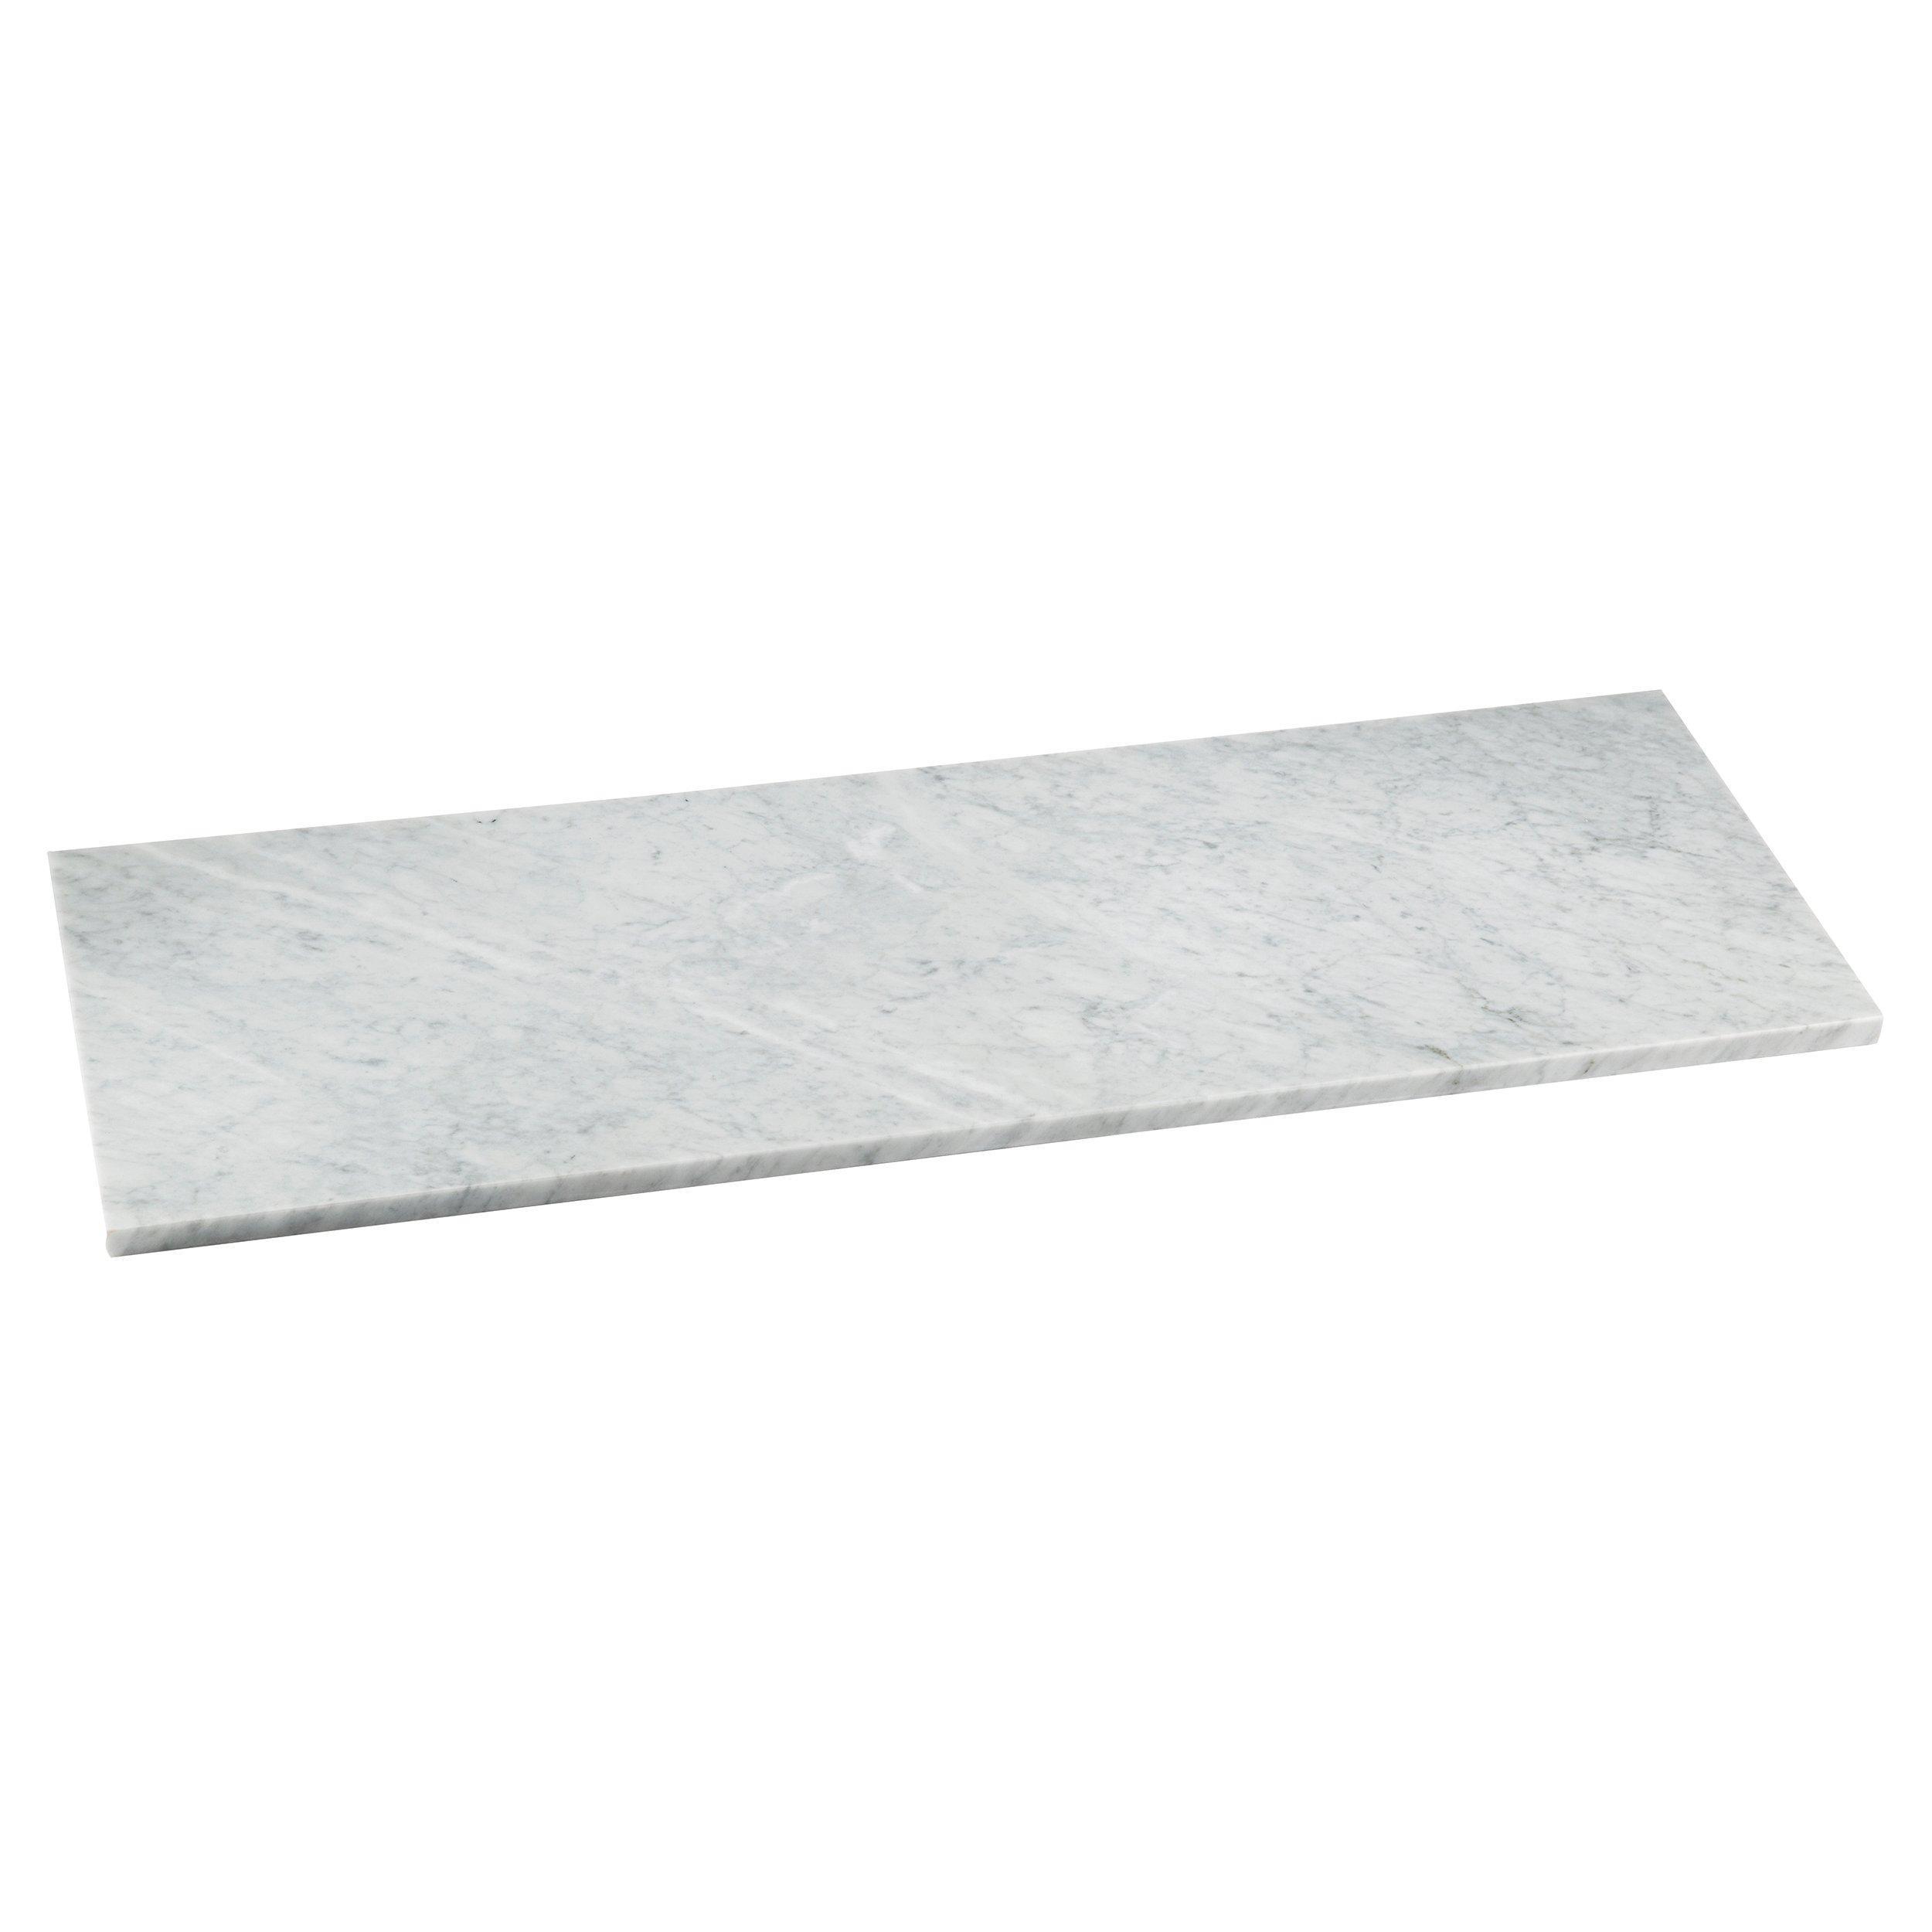 Carrara Marble Carrara Marble 17 X 49 In Rectangle Shower Bench